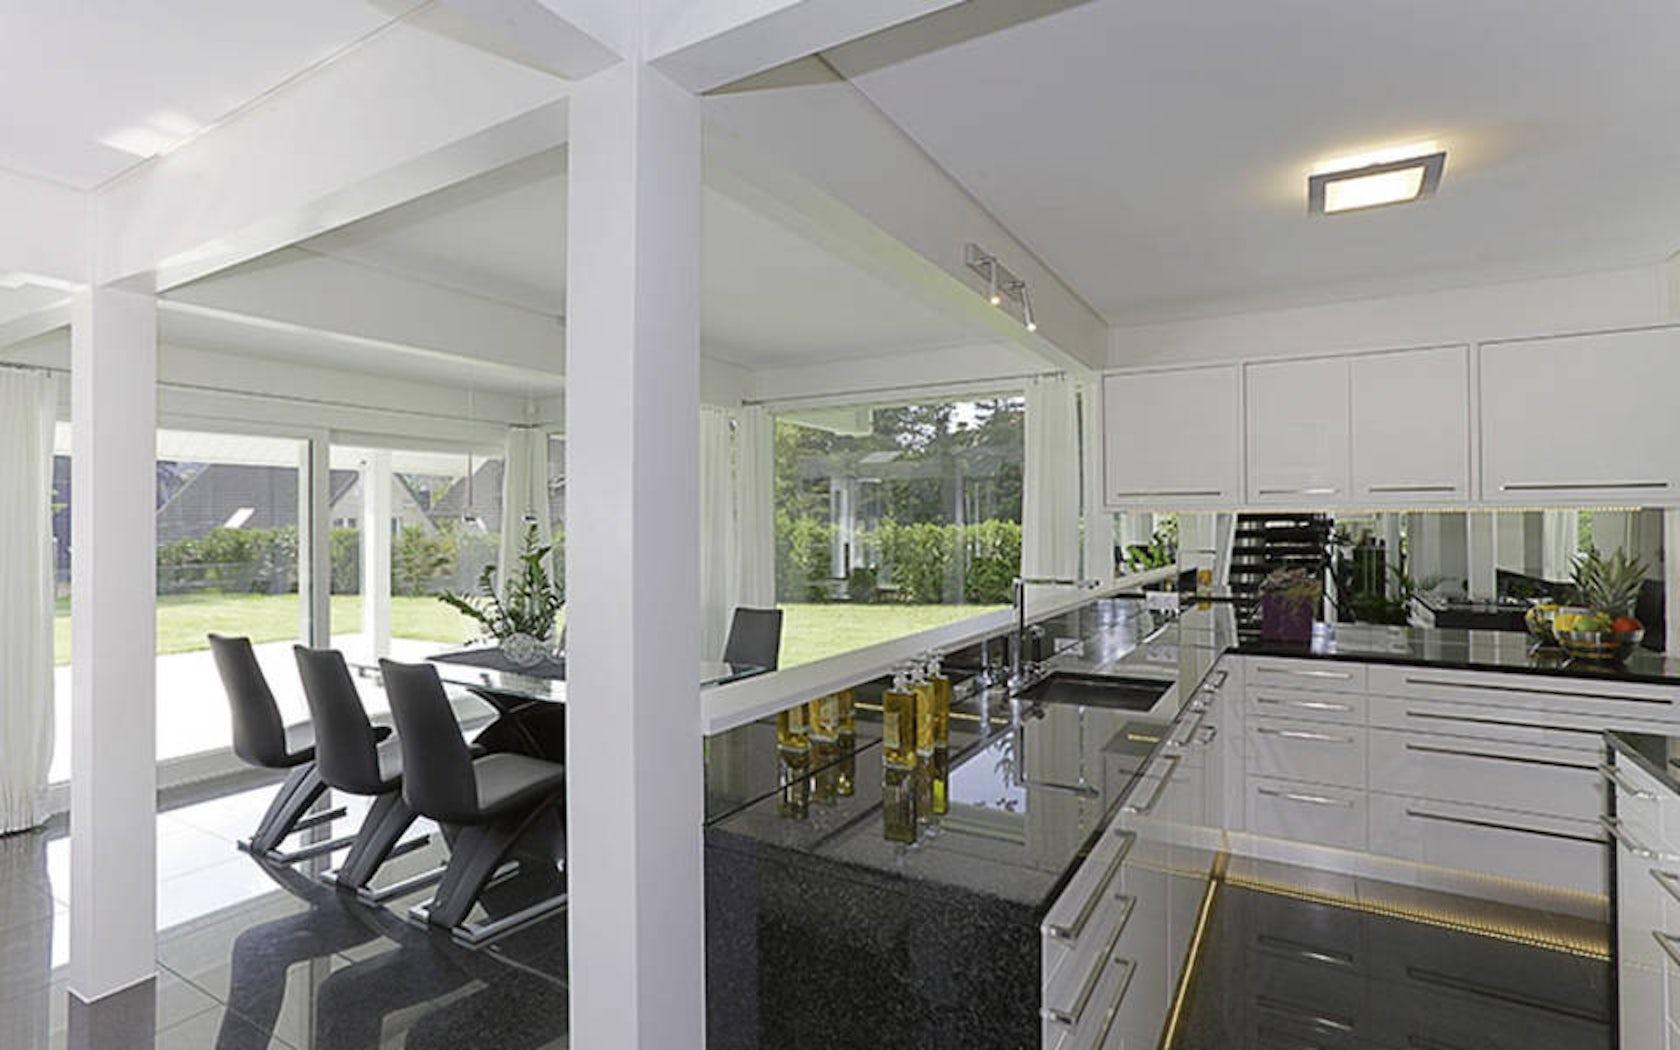 sauerland davinci client house architizer. Black Bedroom Furniture Sets. Home Design Ideas